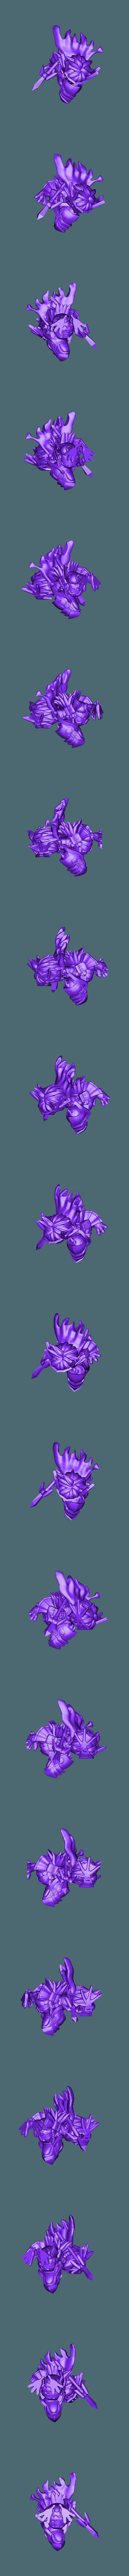 Lord_Knight_Lander.stl Download free STL file Chibi Lord Knight Lander | Ragnarok Online Fan Art • 3D printing object, HyperMiniatures